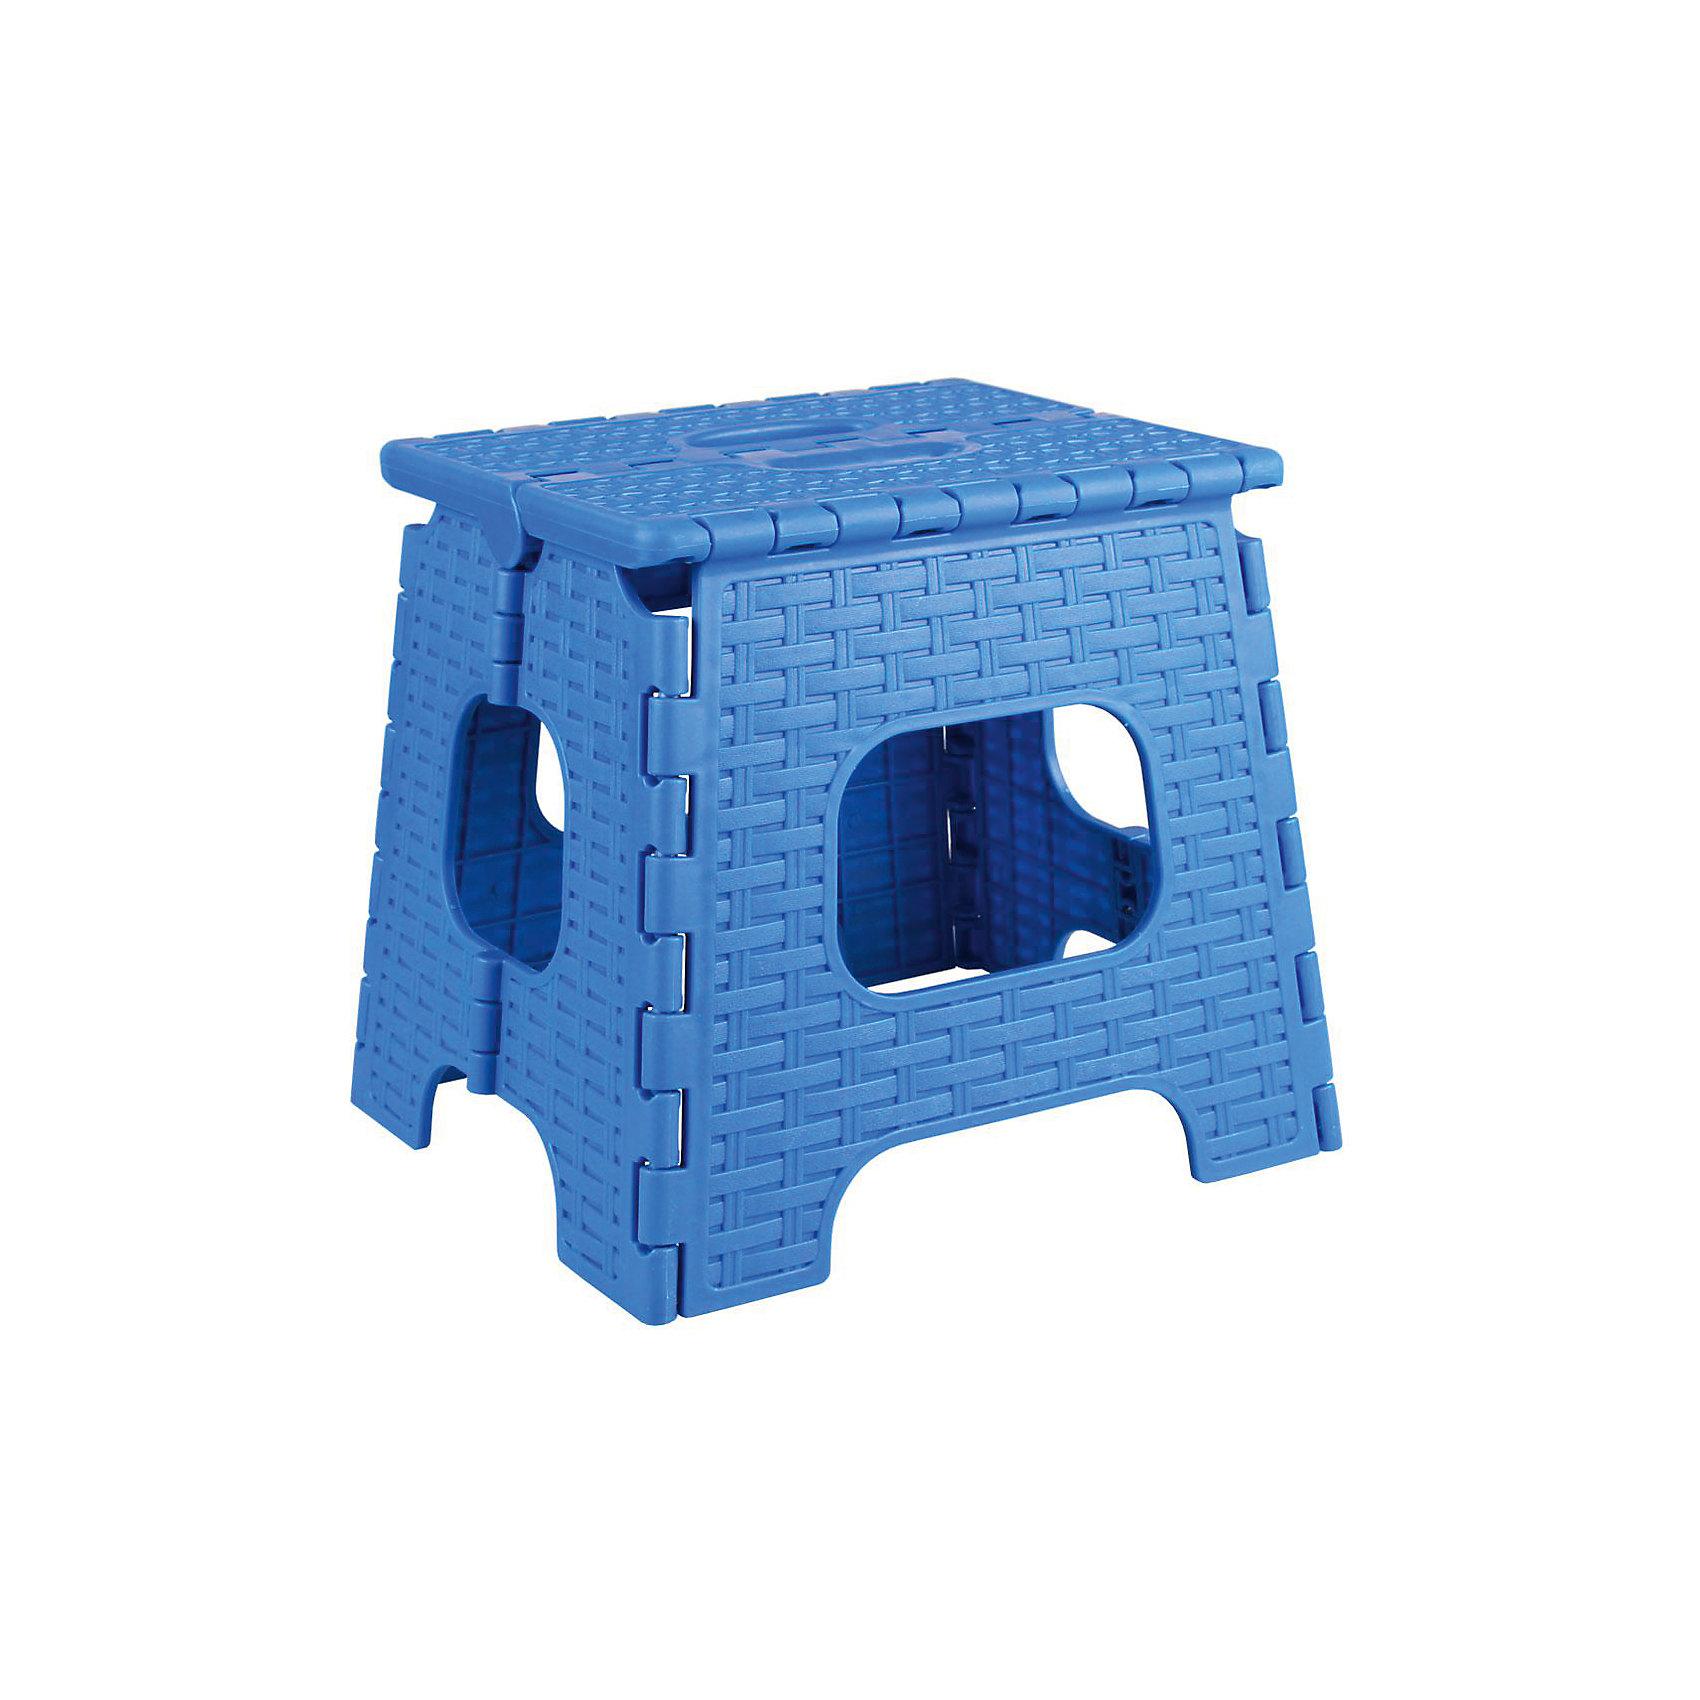 Alternativa Табурет складной Плетенка (малый), Alternativa купить фурнитуру для складной двери